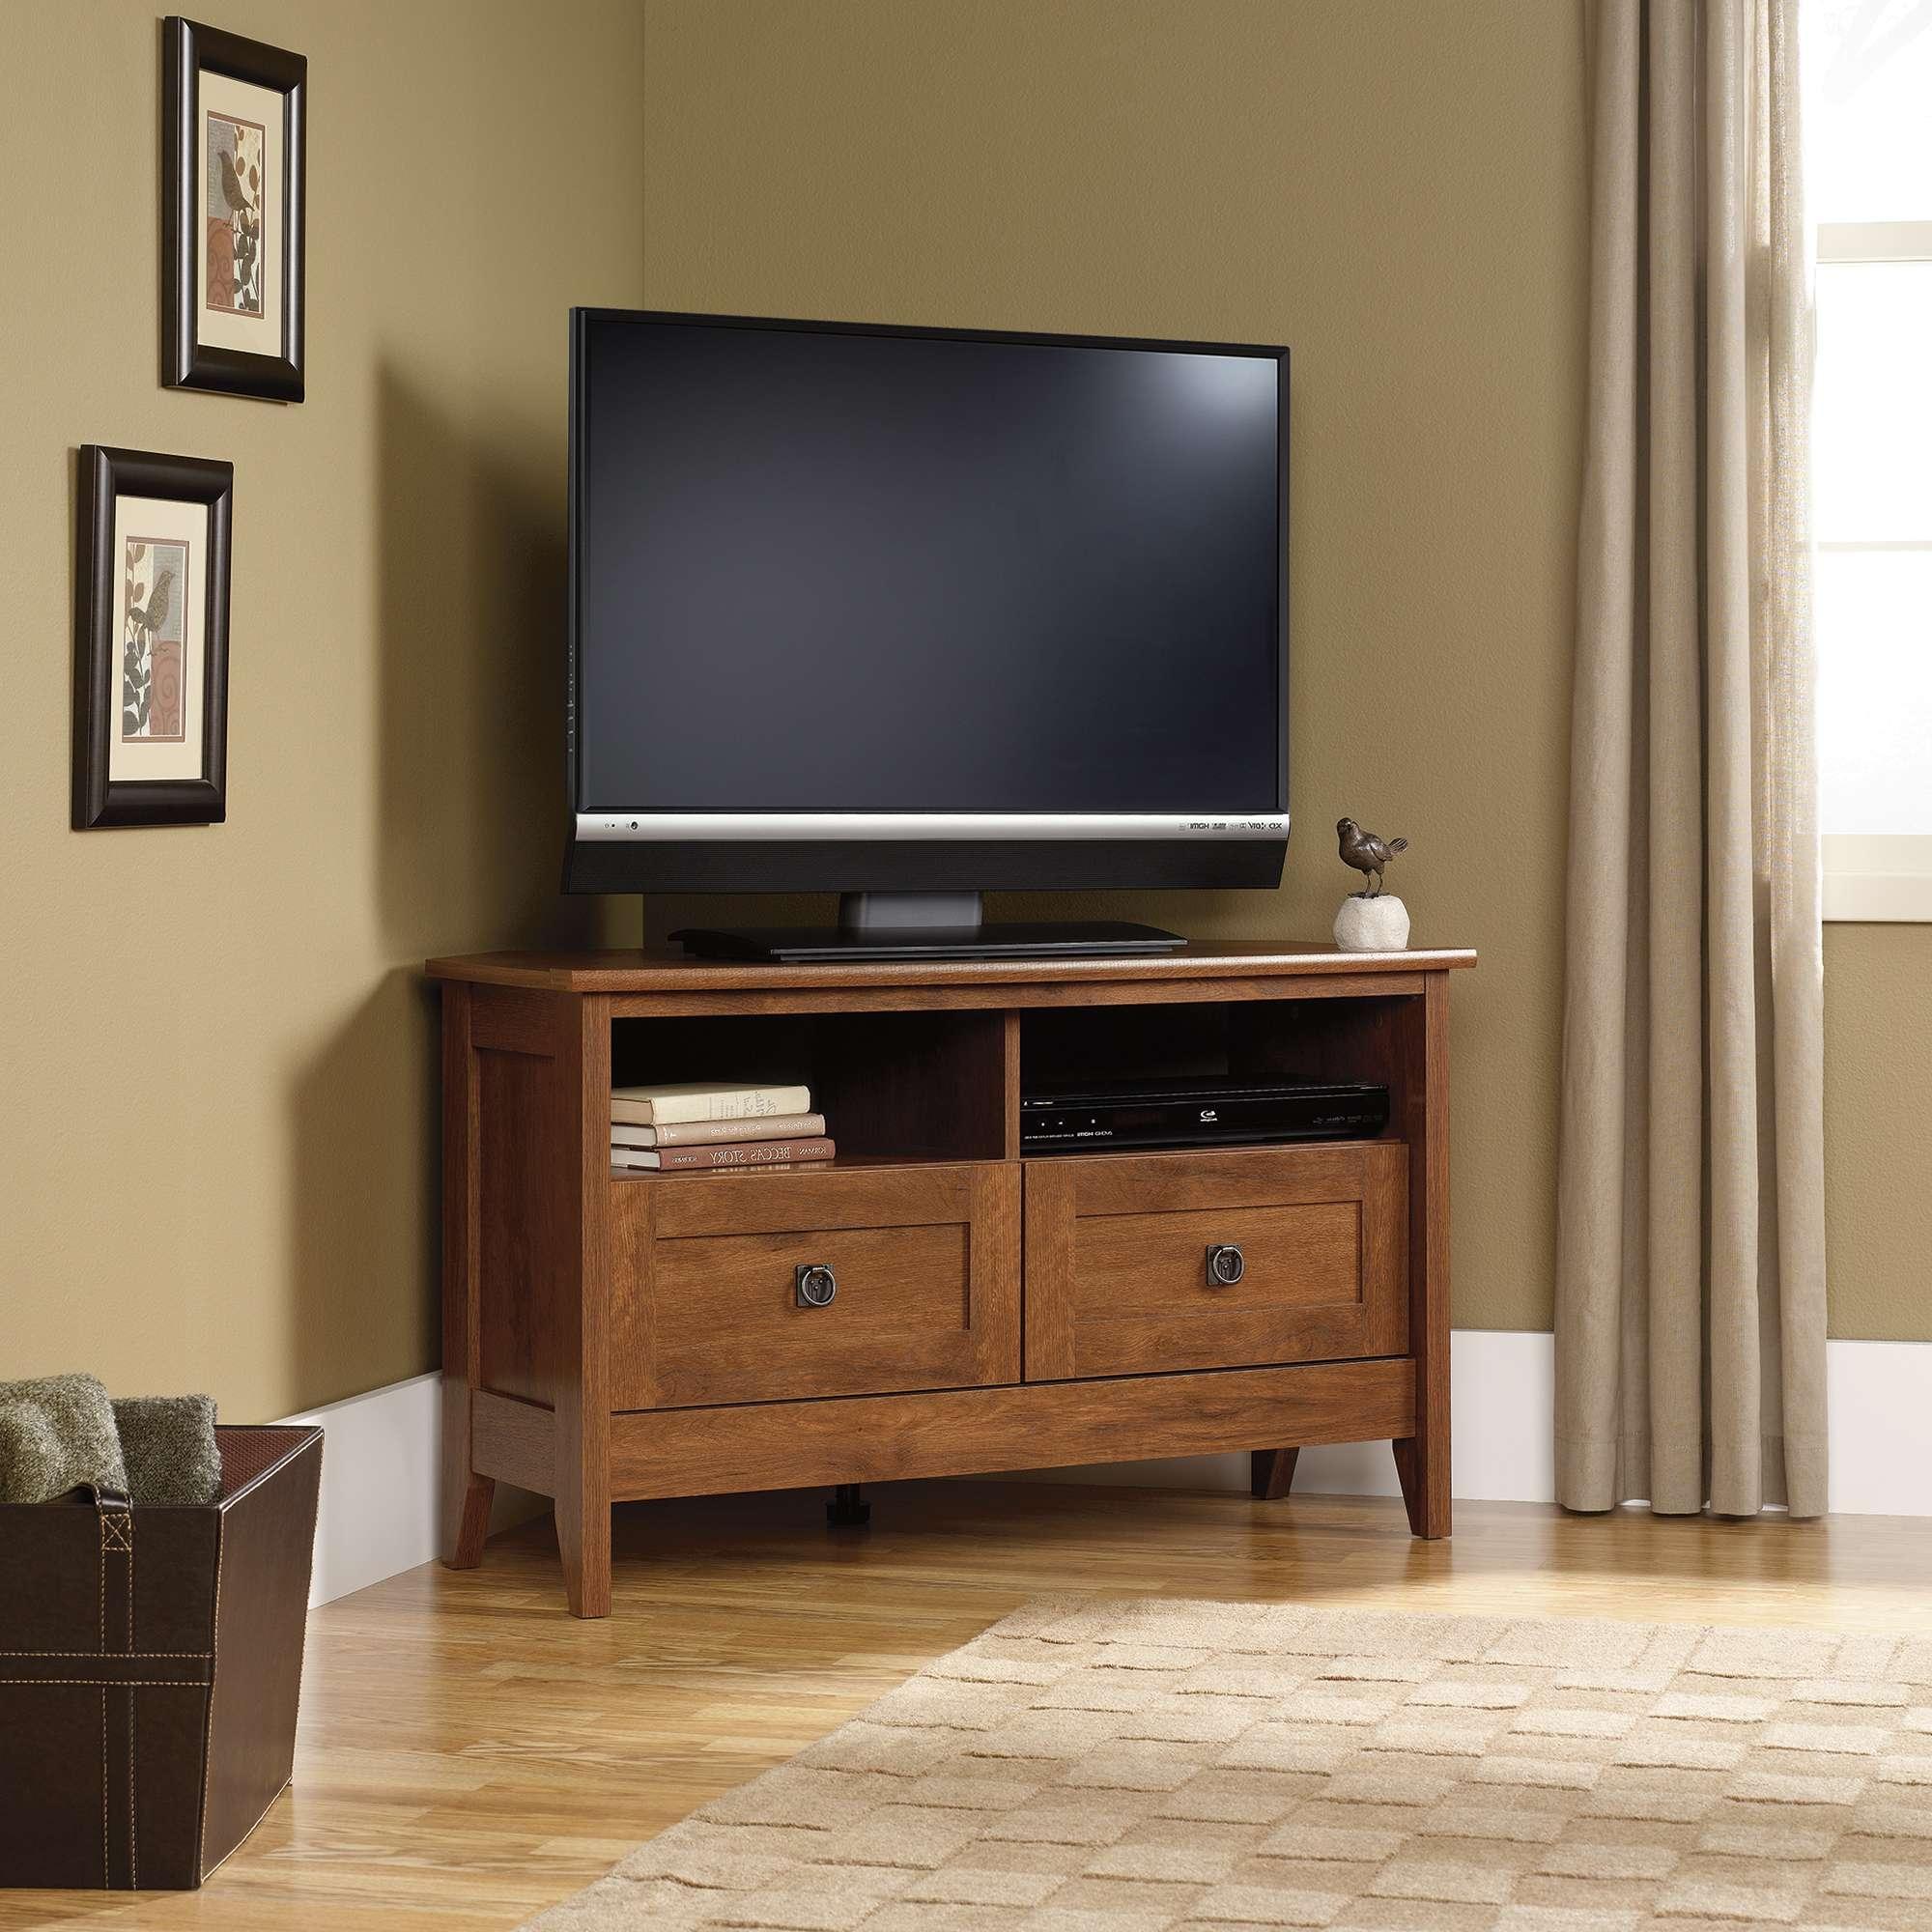 Sauder Select | Corner Tv Stand | 410627 | Sauder Regarding Oak Furniture Tv Stands (View 10 of 20)